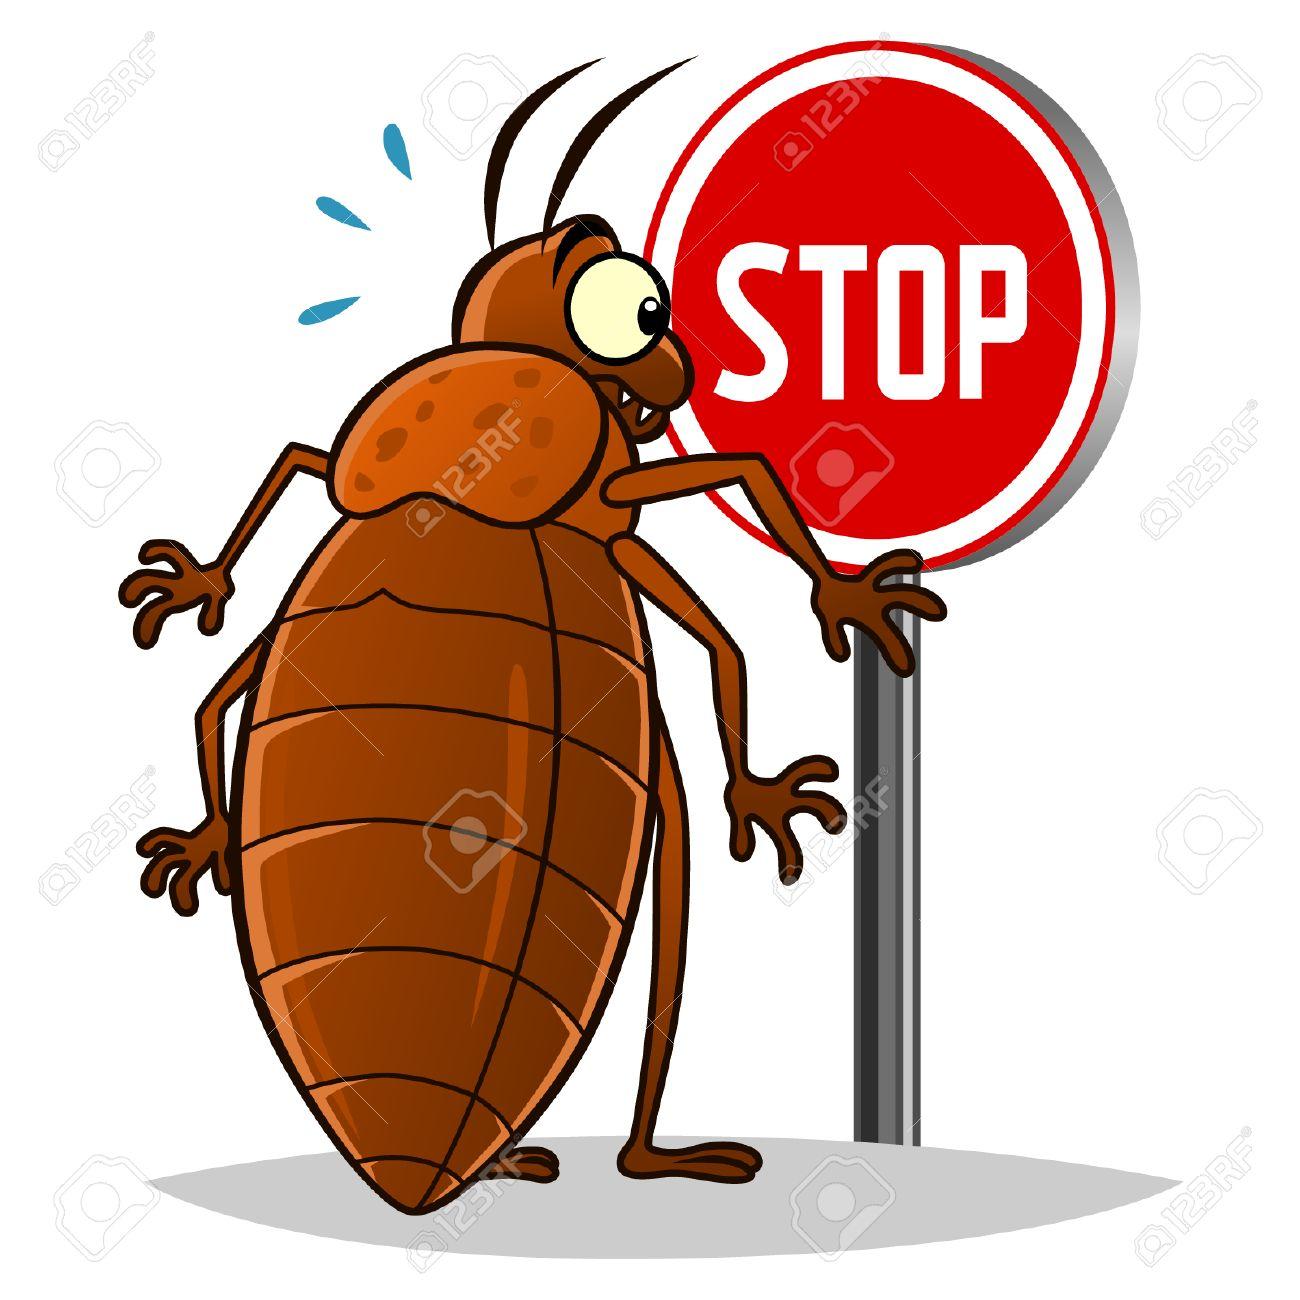 Stop pest illustration with a funny cartoon bedbug - 39342007